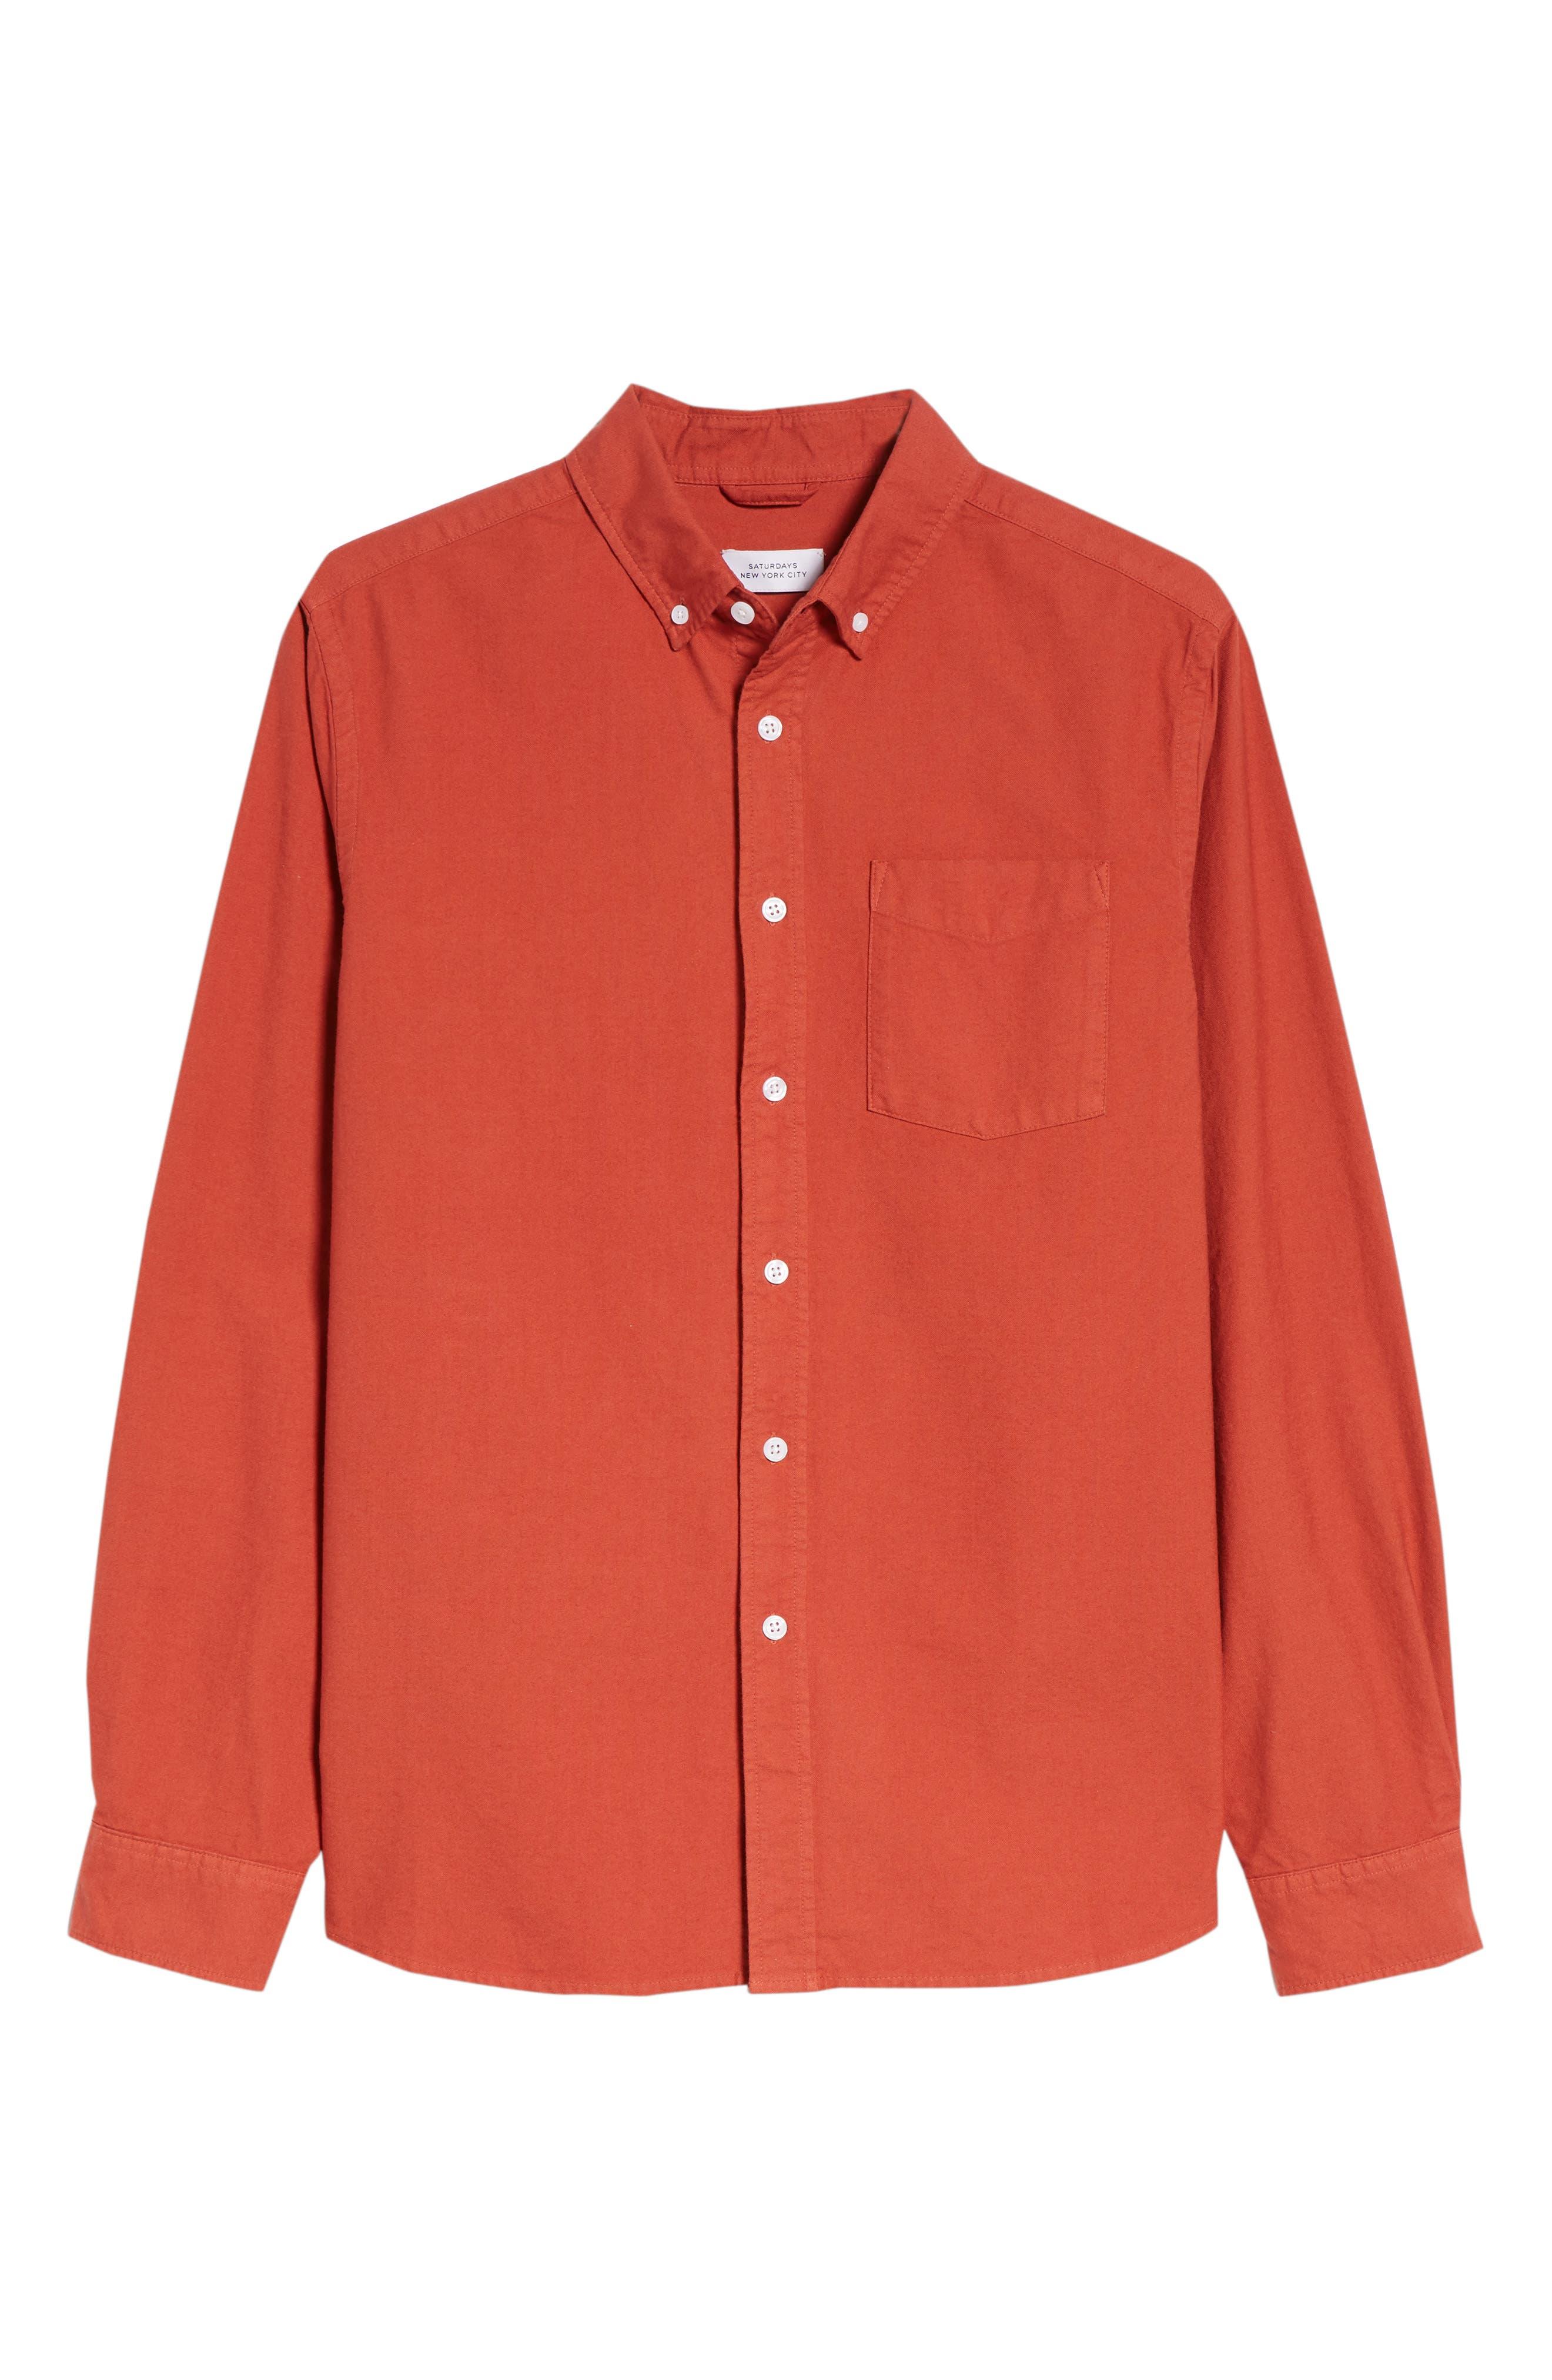 Crosby Oxford Woven Shirt,                             Alternate thumbnail 6, color,                             600